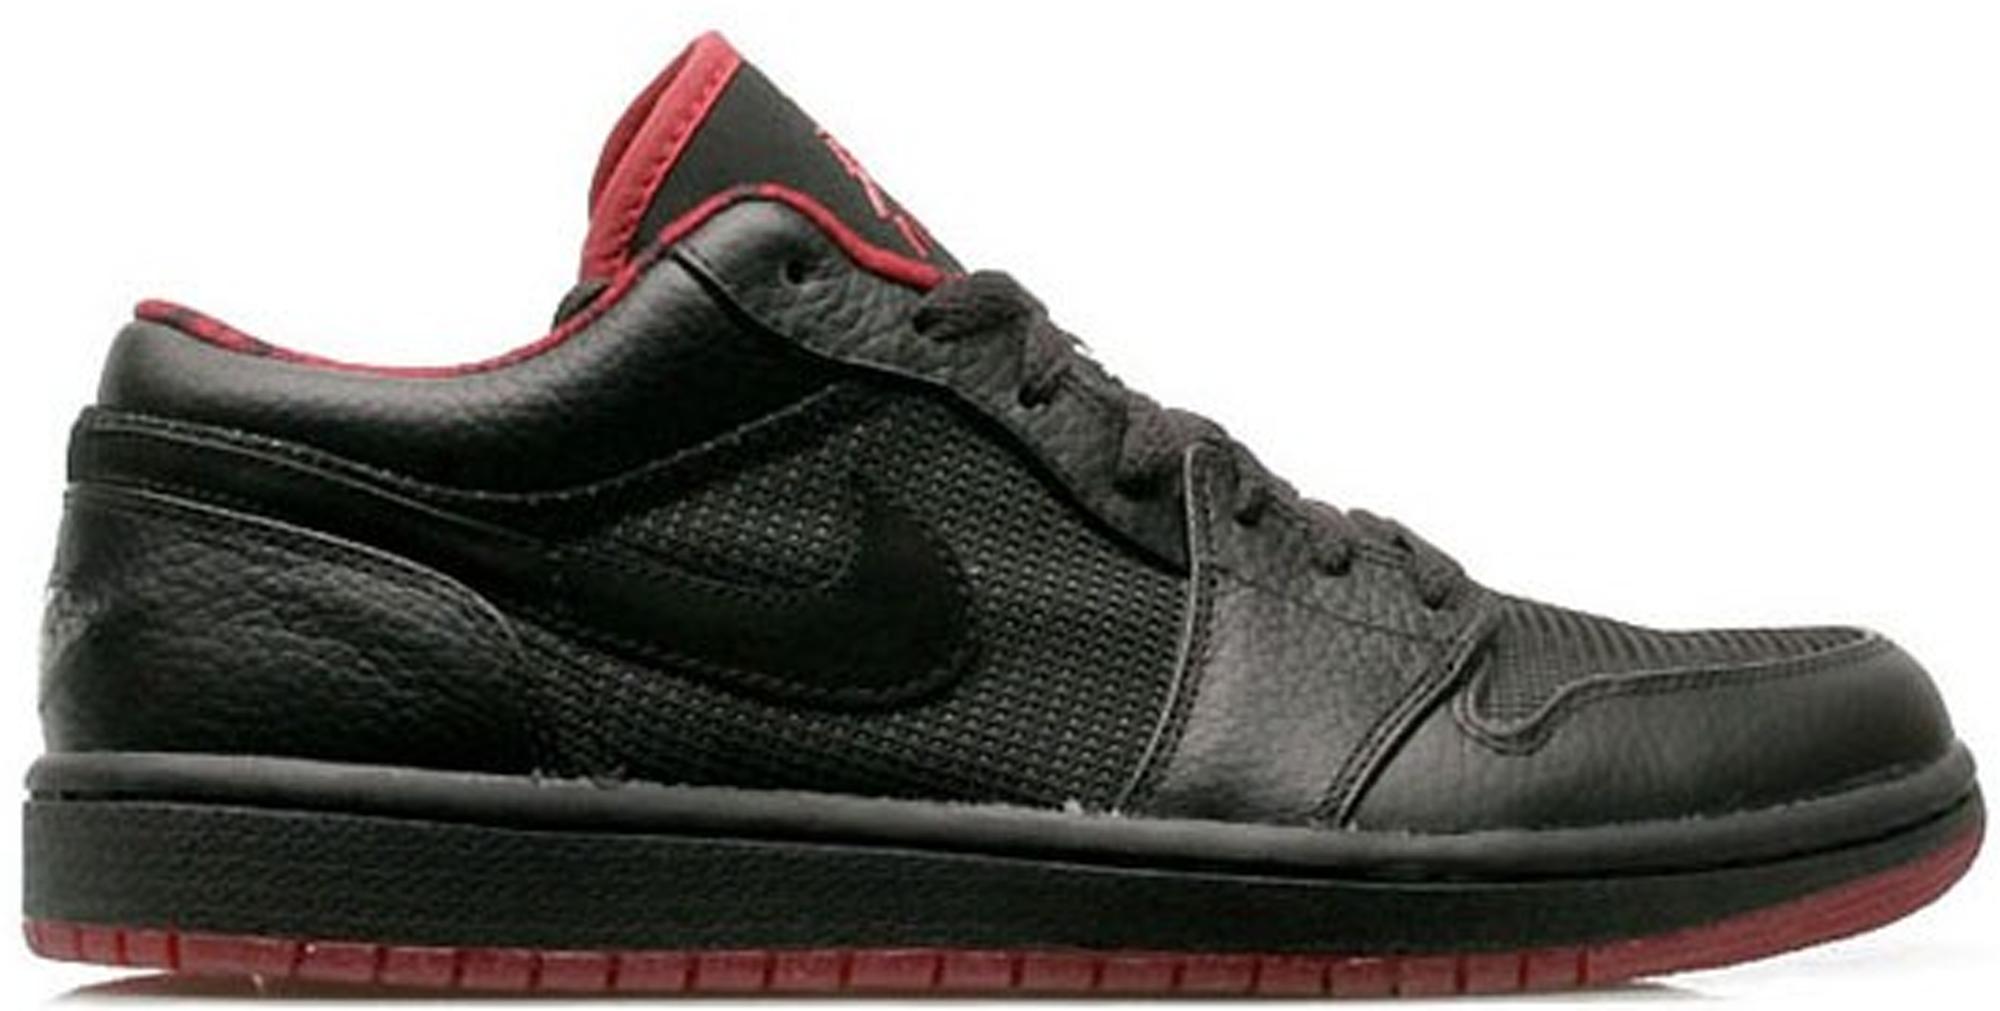 red and black low top jordans